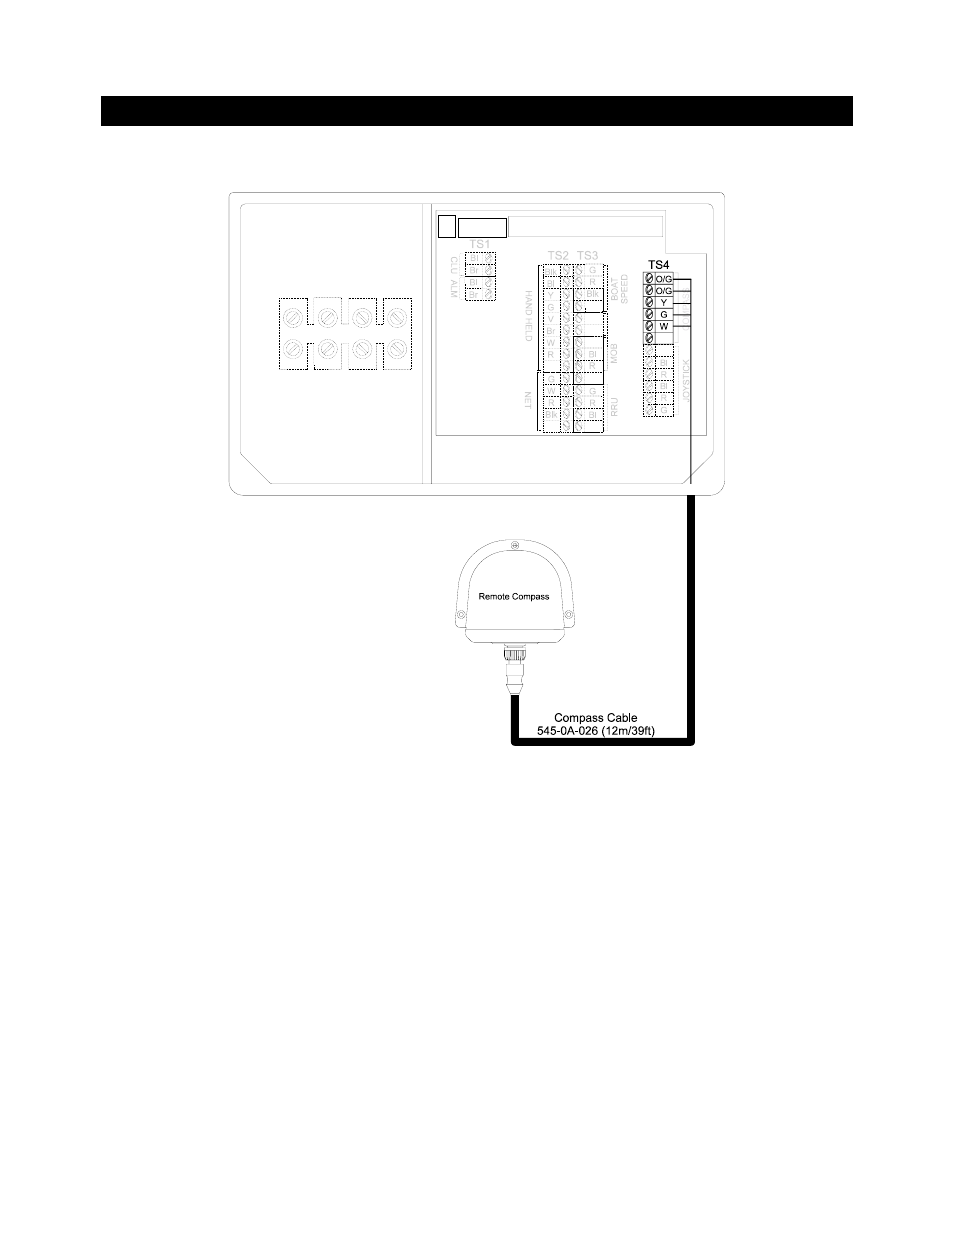 remote compass connections b g network pilot acp user manual rh manualsdir com